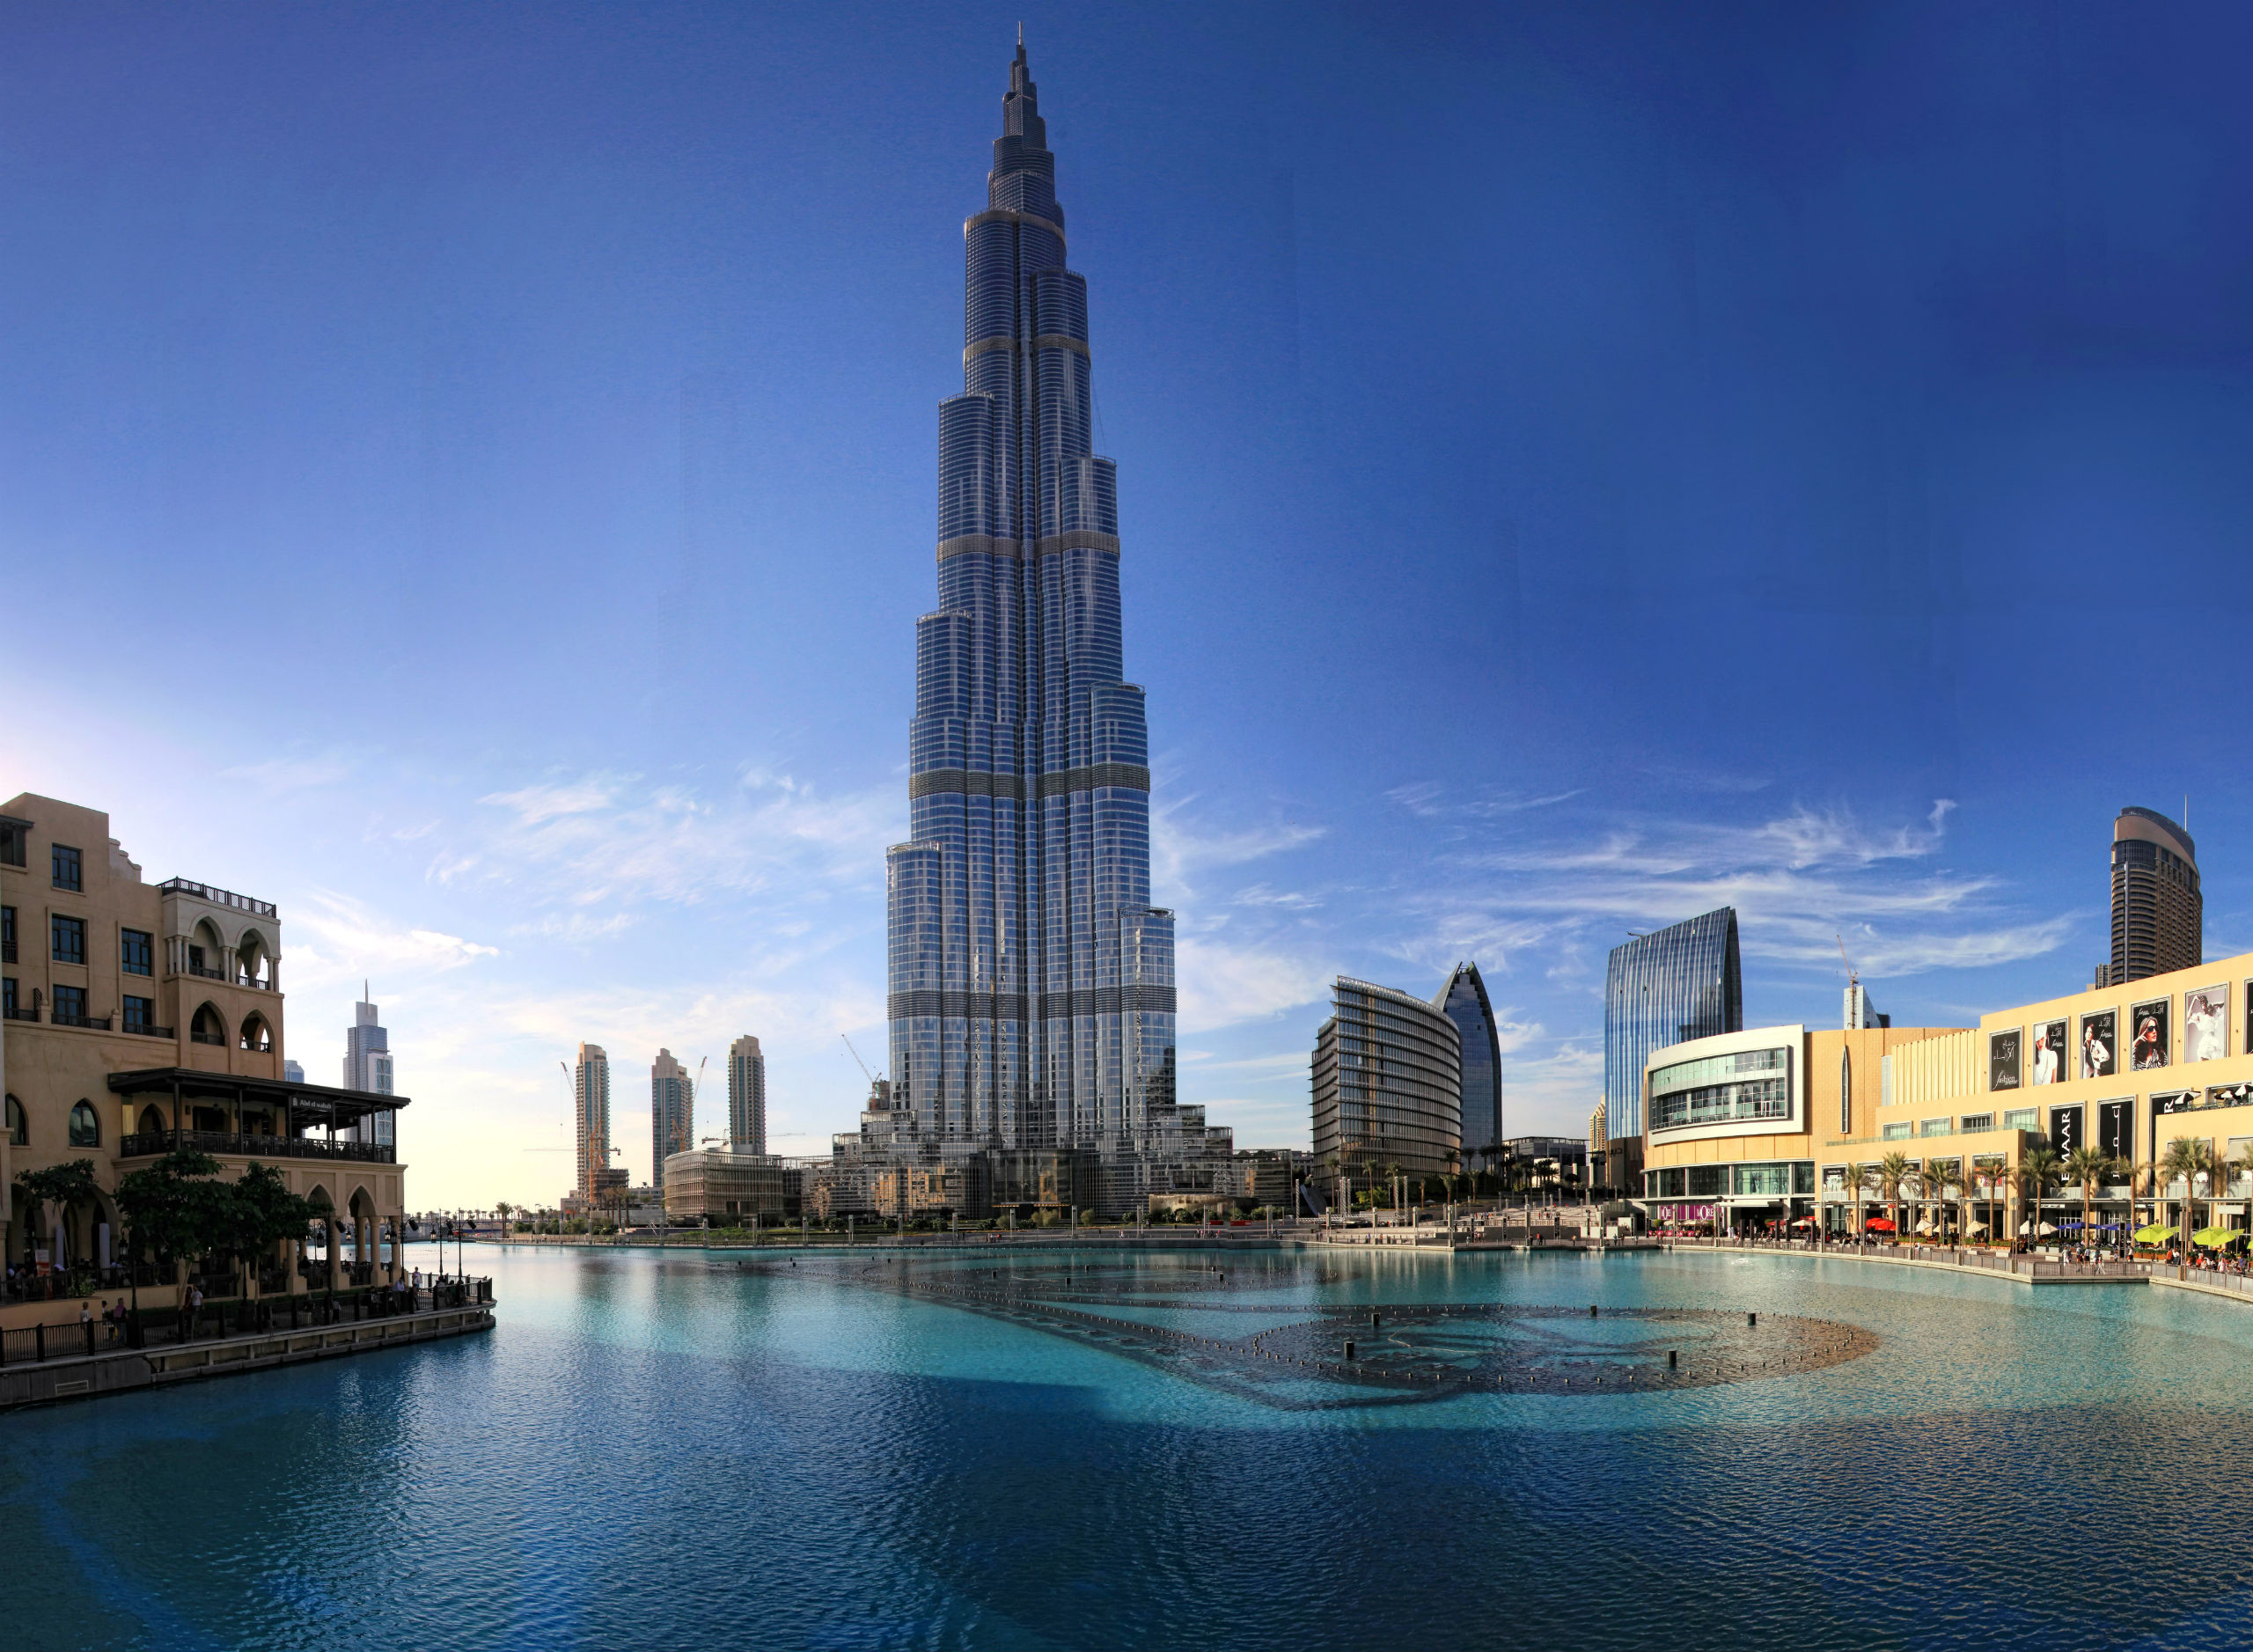 Khalifa Tower, Dubai Full HD Wallpaper And Background